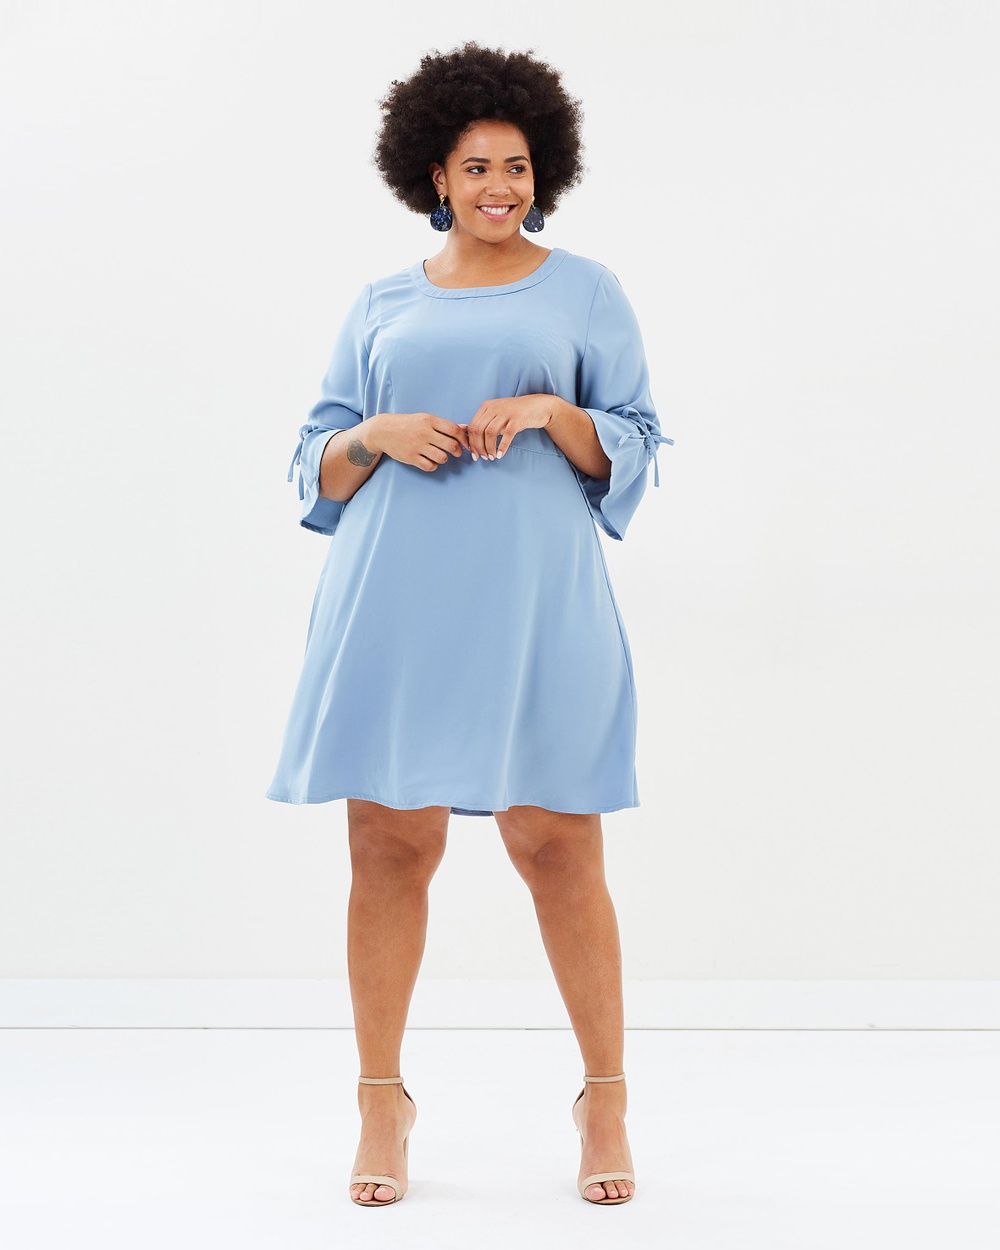 JUNAROSE 3 4 Sleeve Dress Dresses Ashley Blue 3-4 Sleeve Dress